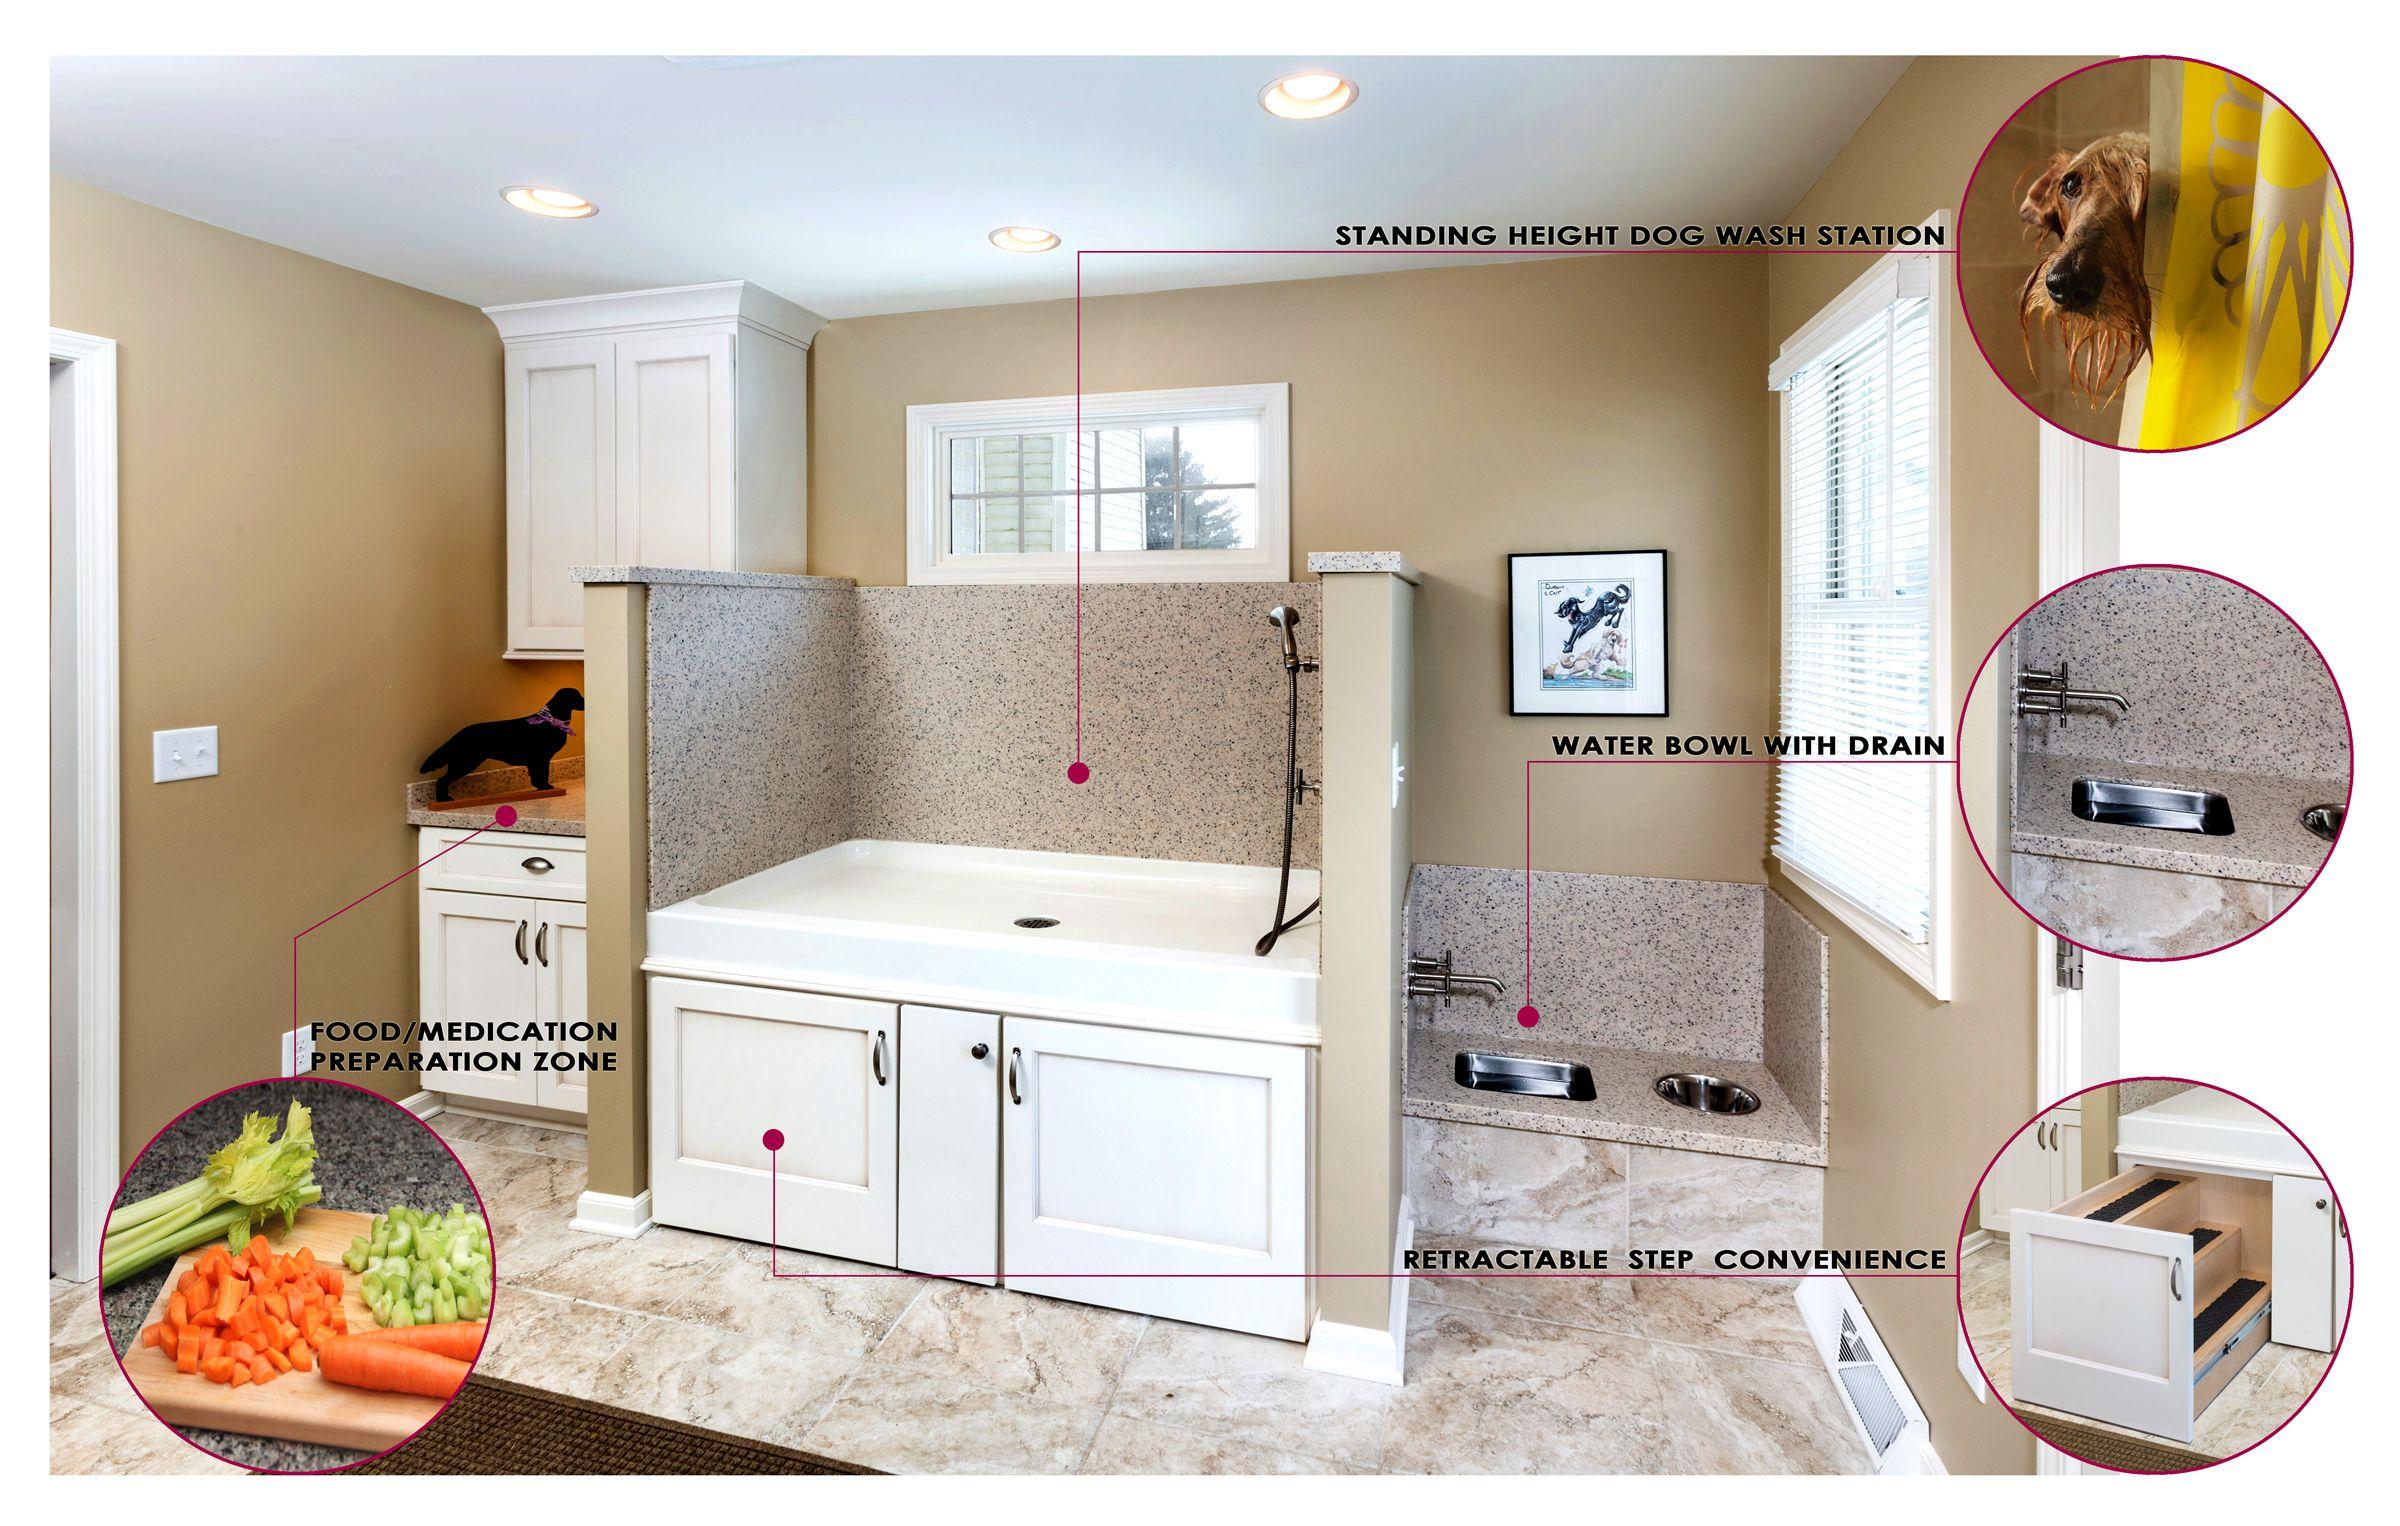 A mud room designed for your dog dog rooms dog washing